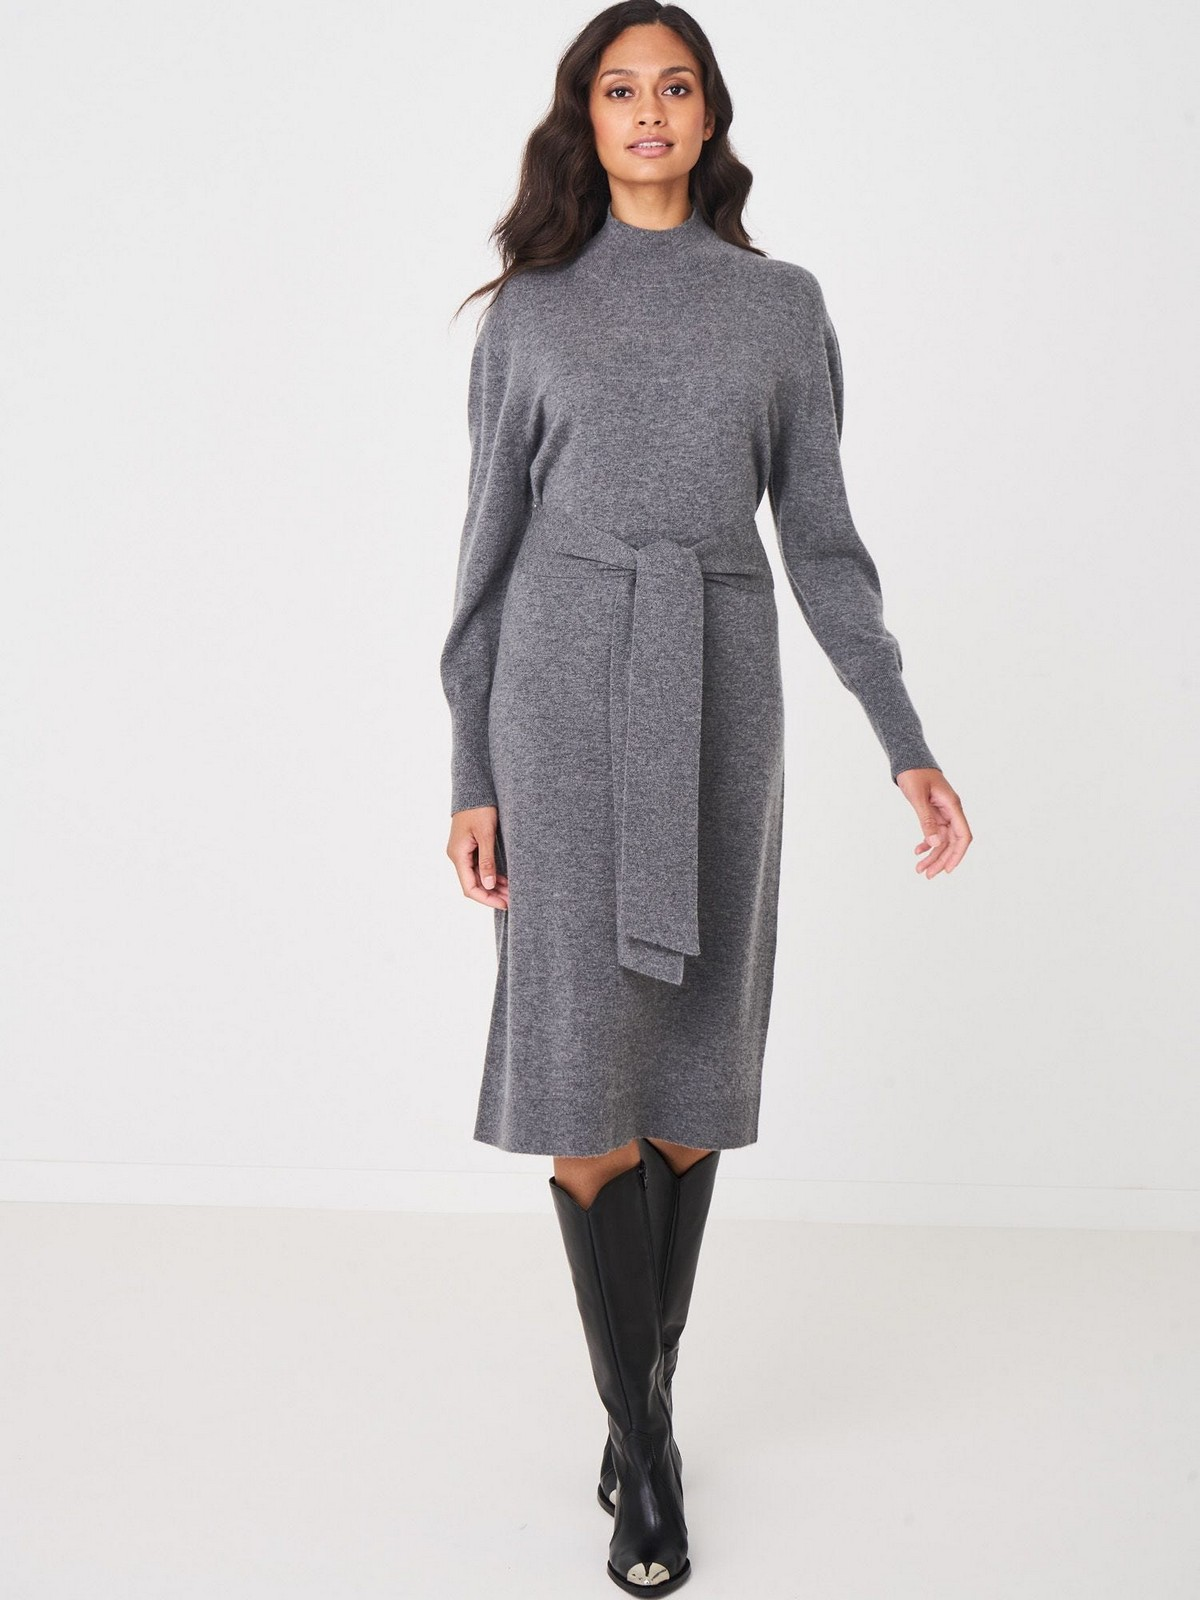 Repeat - 200238 - Kleed tricot lang